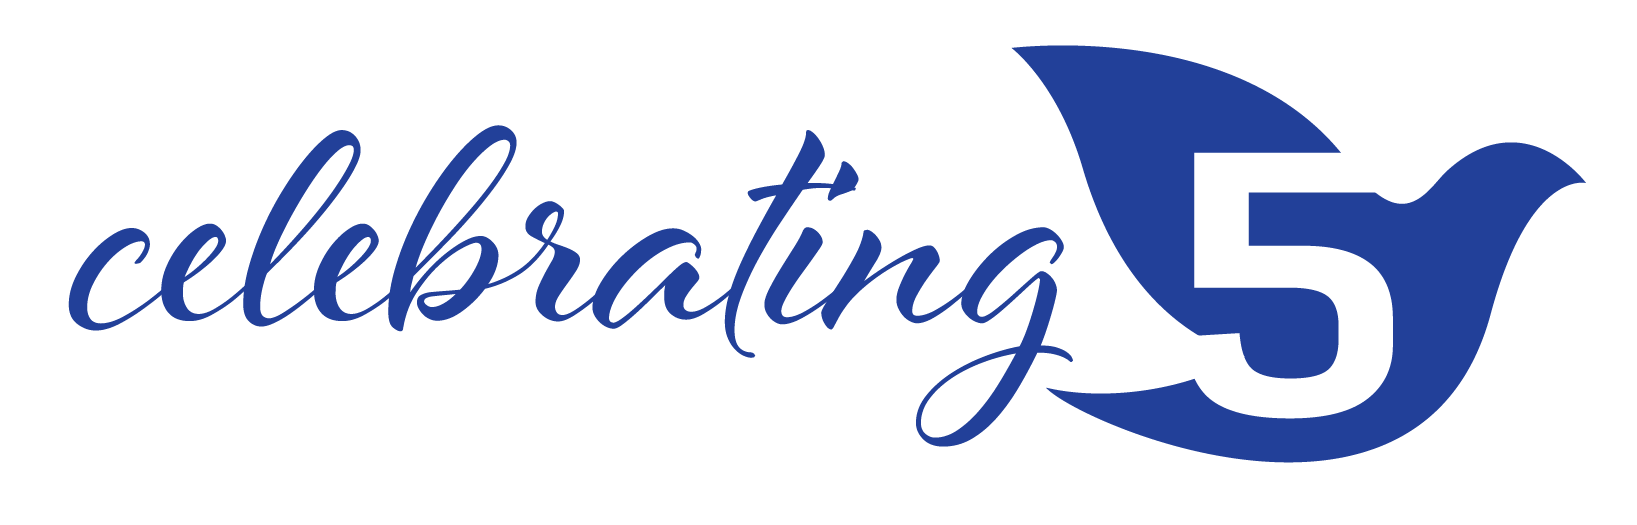 Peace-5-logo-01.png